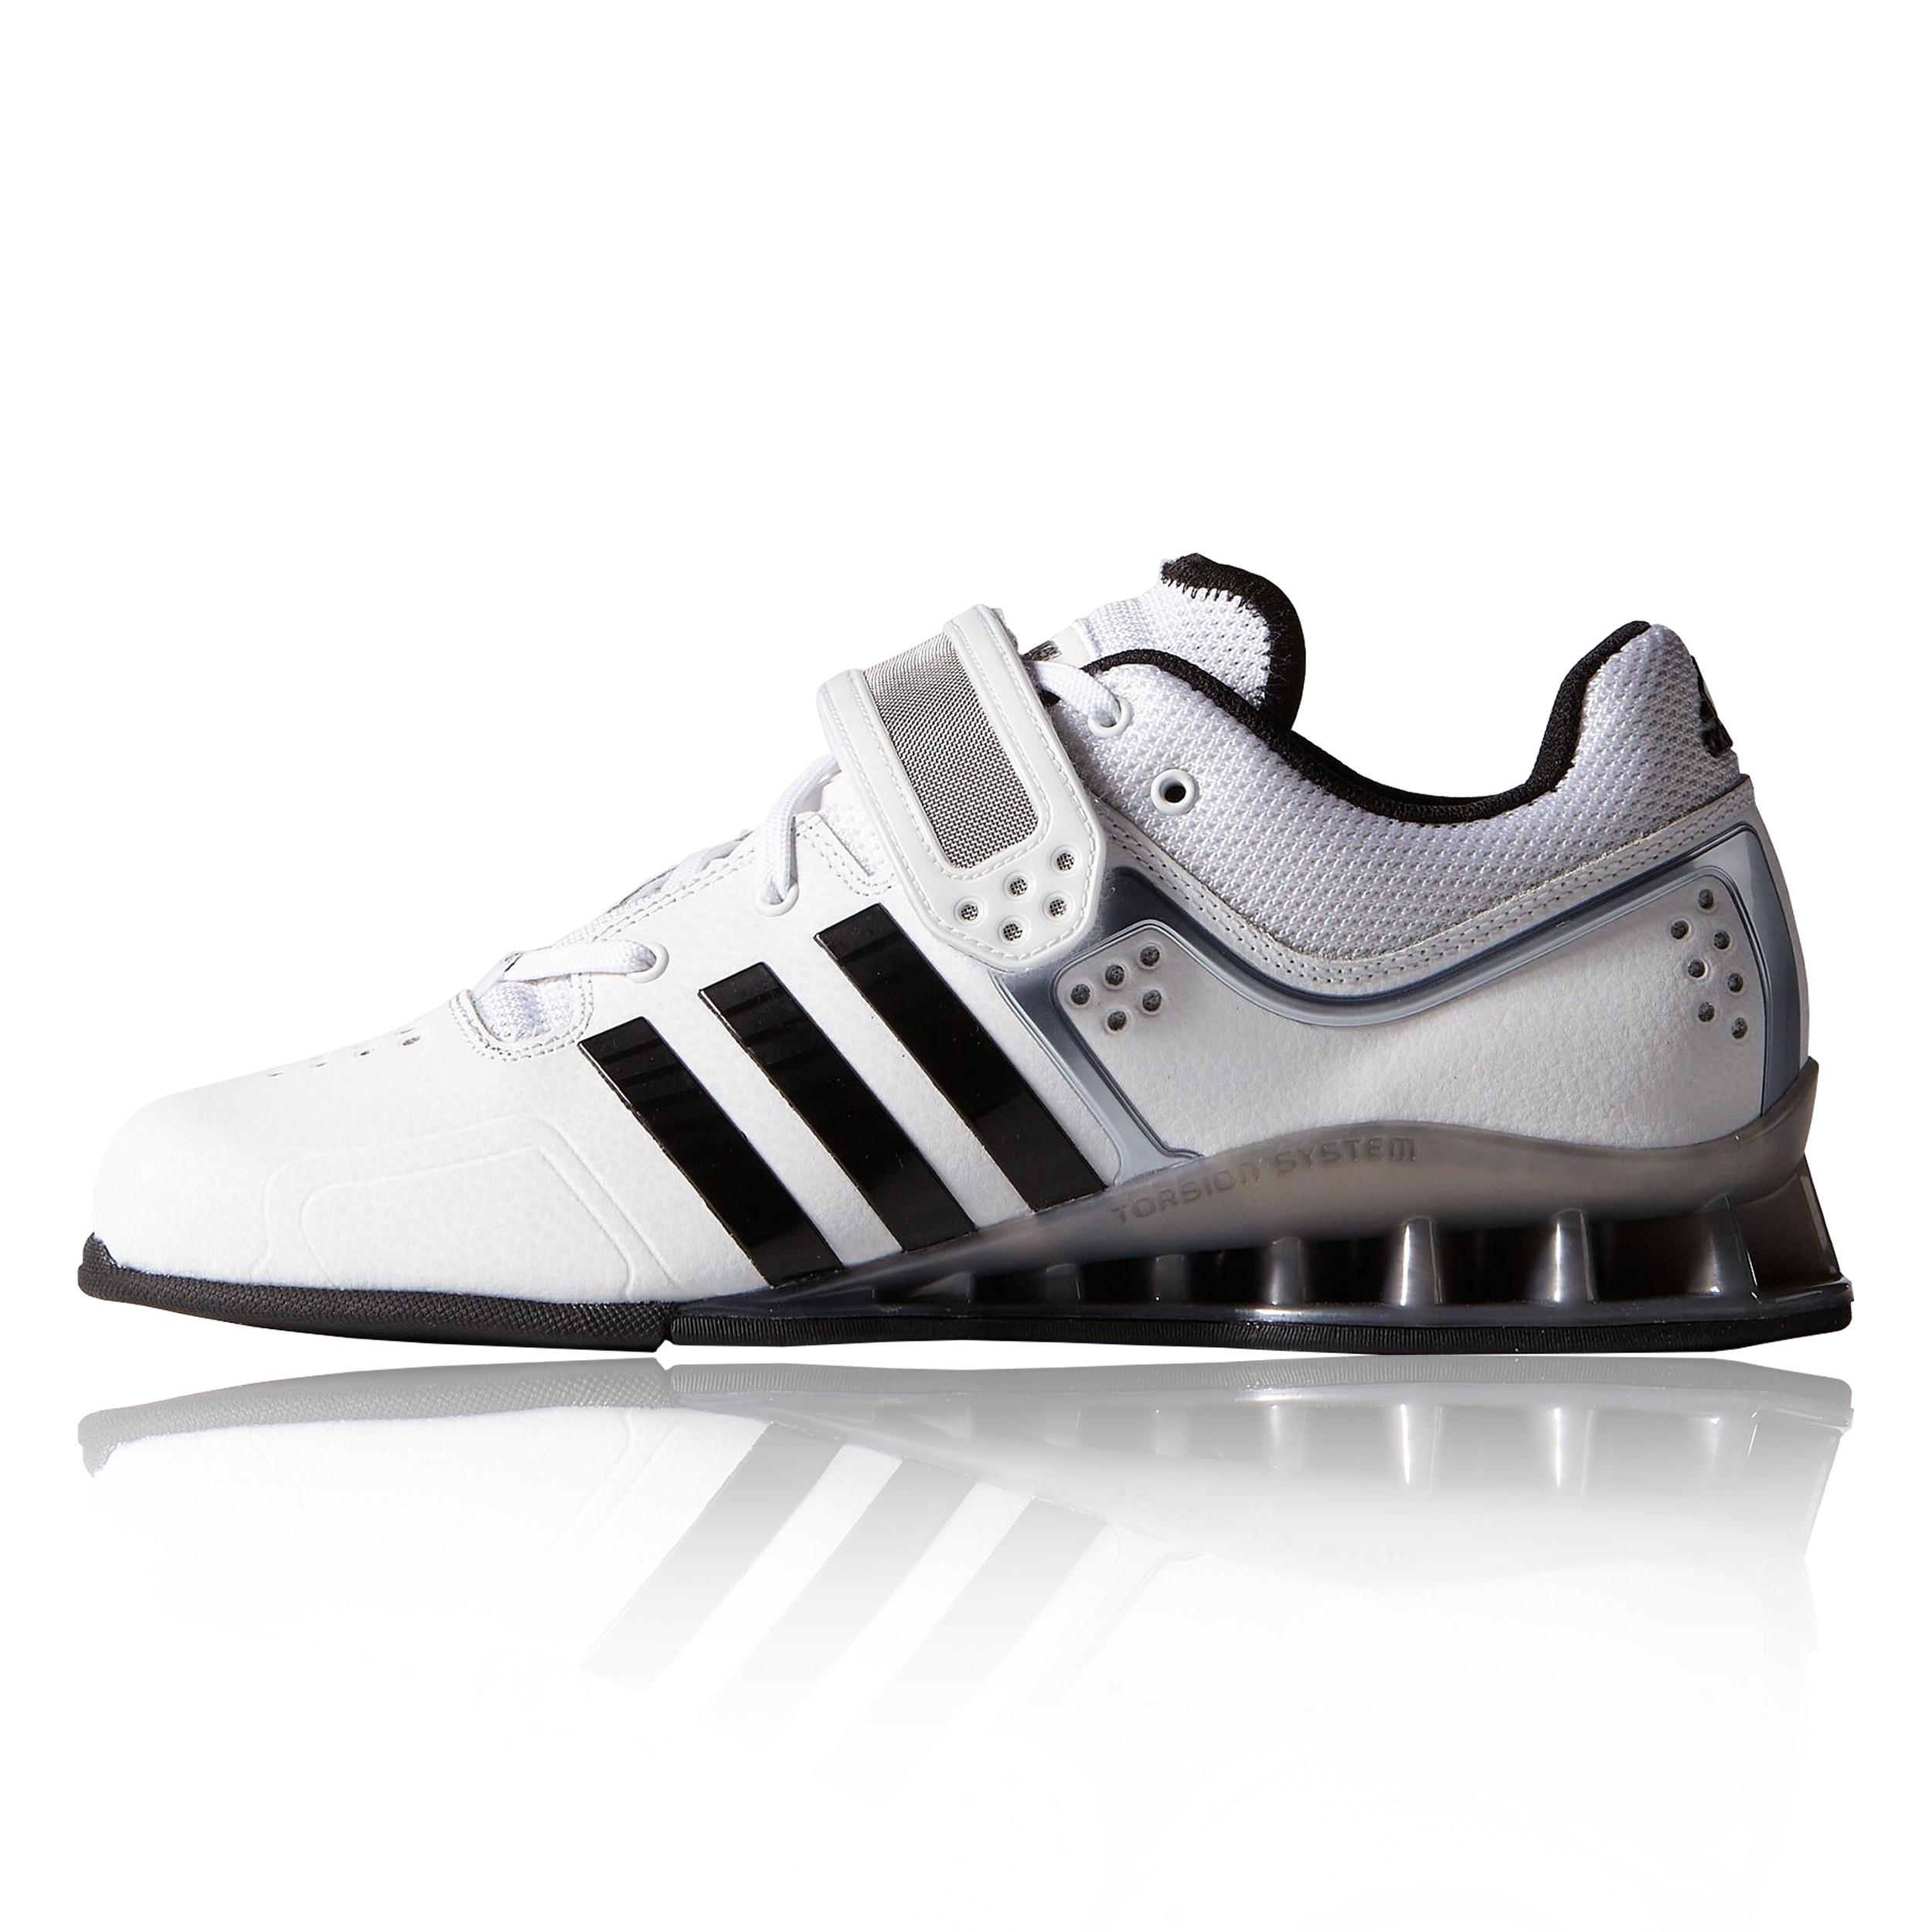 Adidas Adistar Weightlifting Shoes Uk